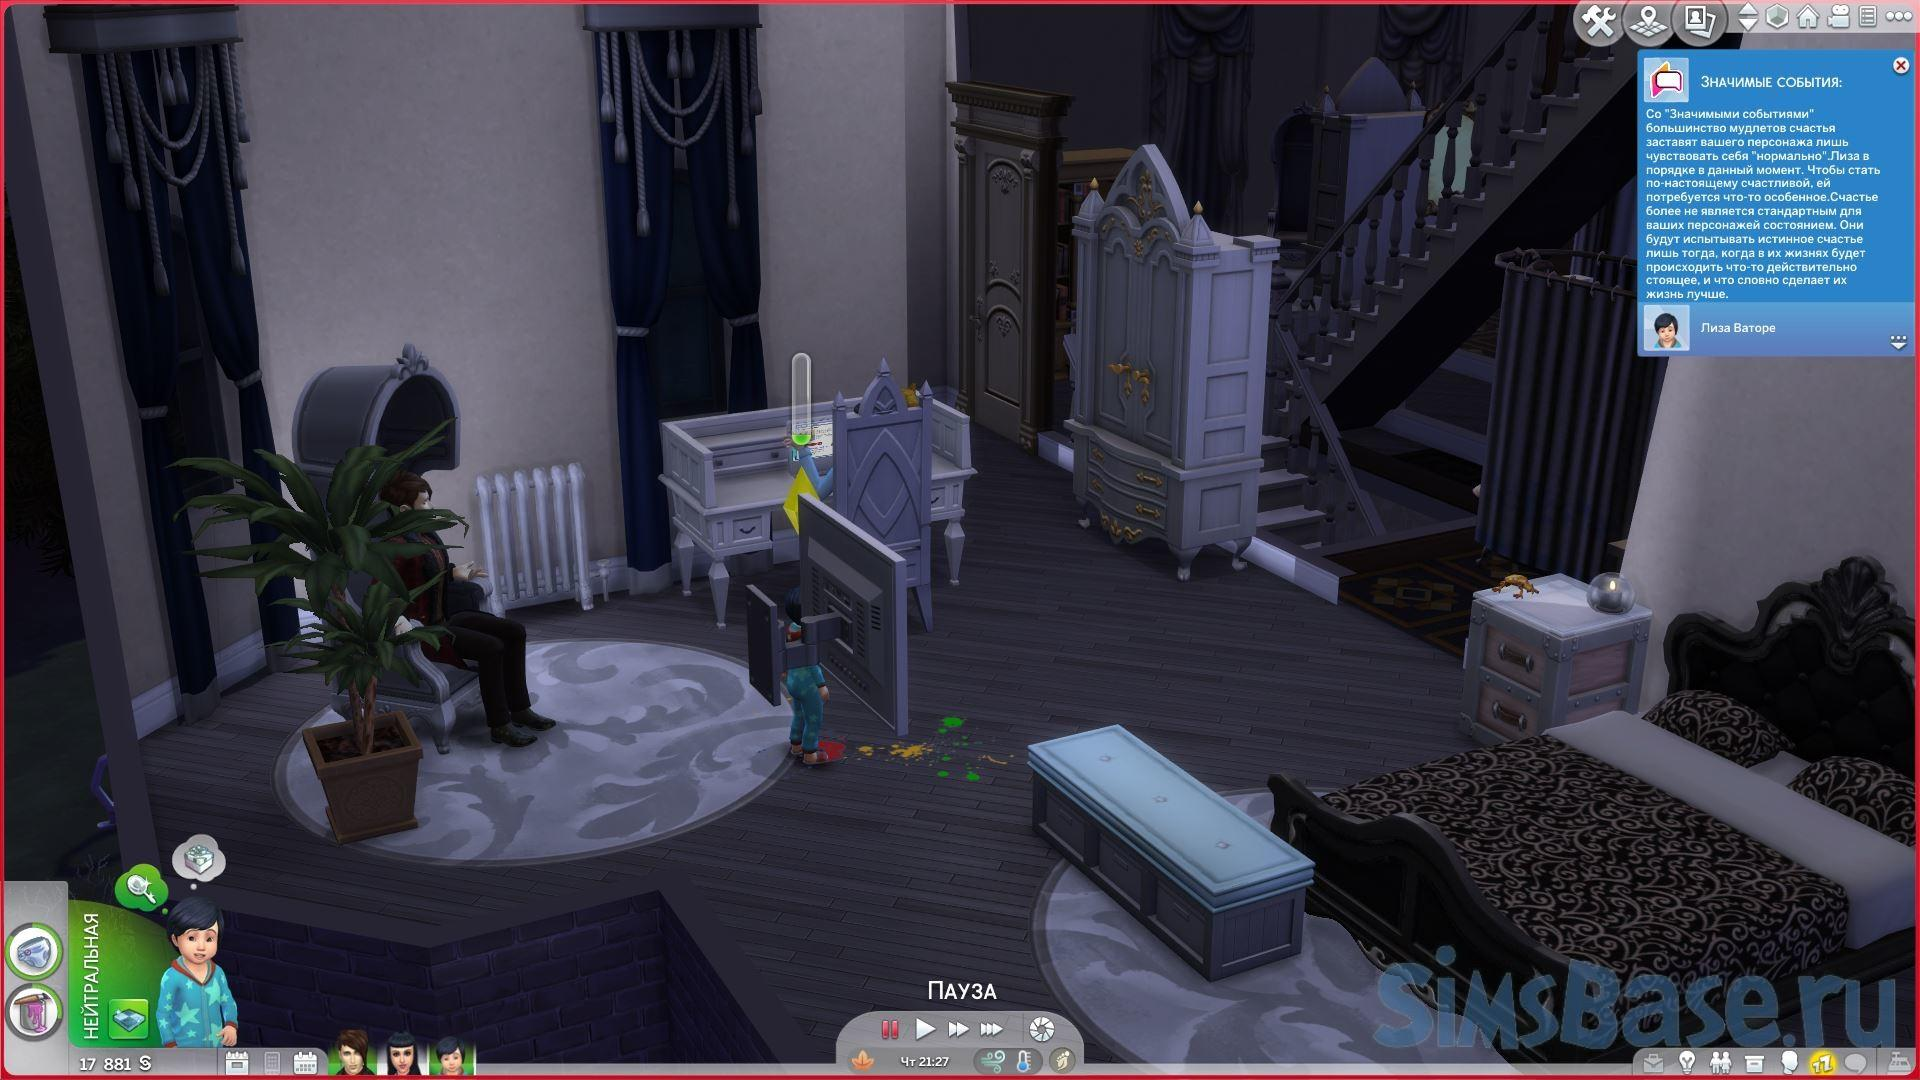 Моды «Значимые истории или Meaningful stories» от roburky для Sims 4